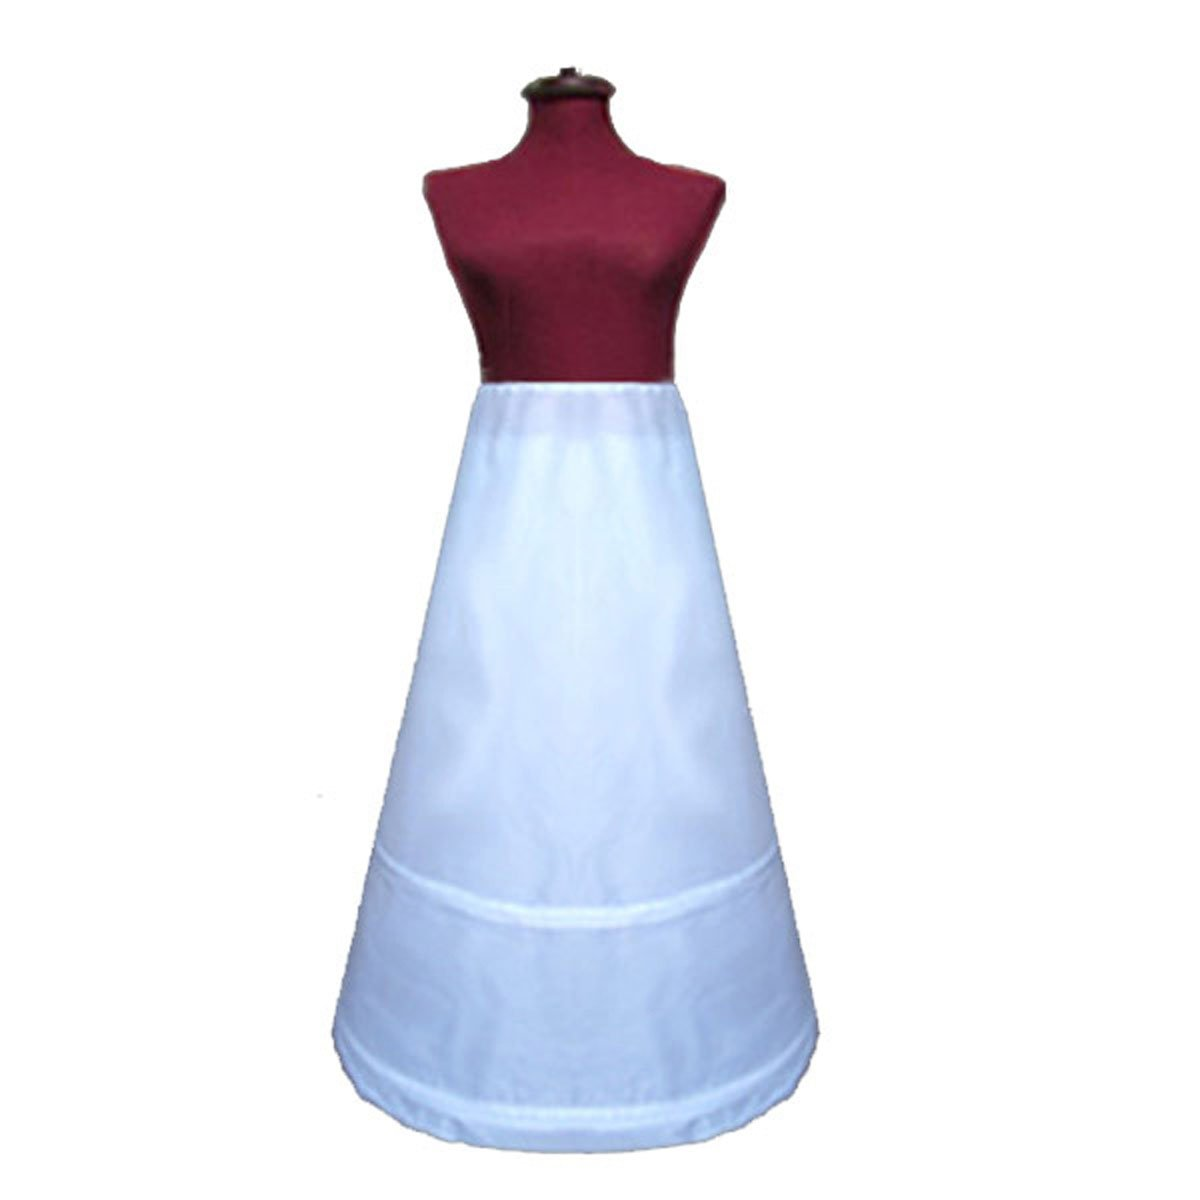 SACASUSA (TM) Adjustable 2-Hoop A-Line Wedding Bridal Petticoat Slip Circumf. 77 Inch